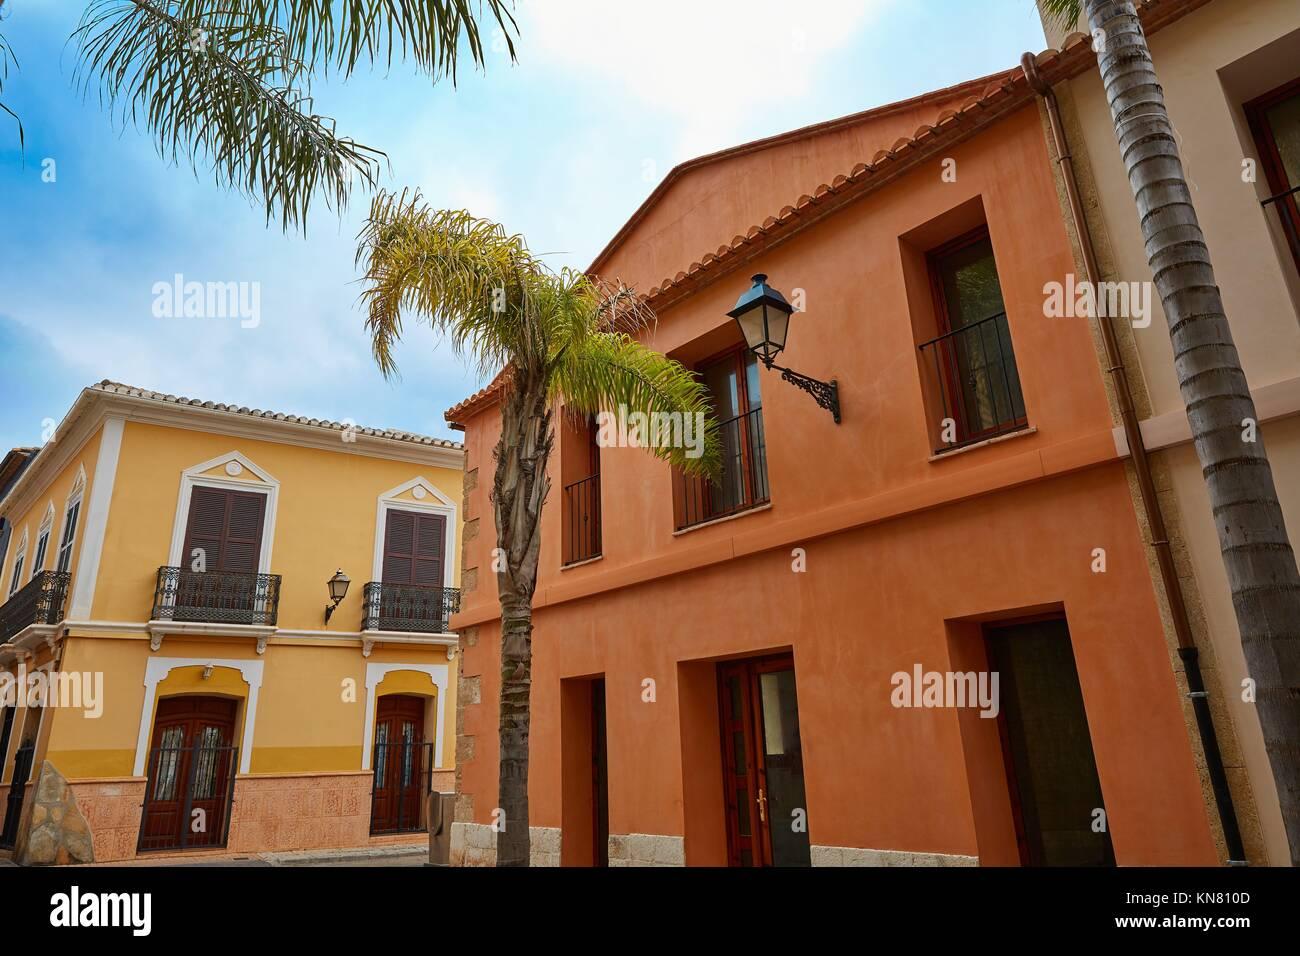 Denia street Loreto facades in Alicante at Mediterranean spain. - Stock Image